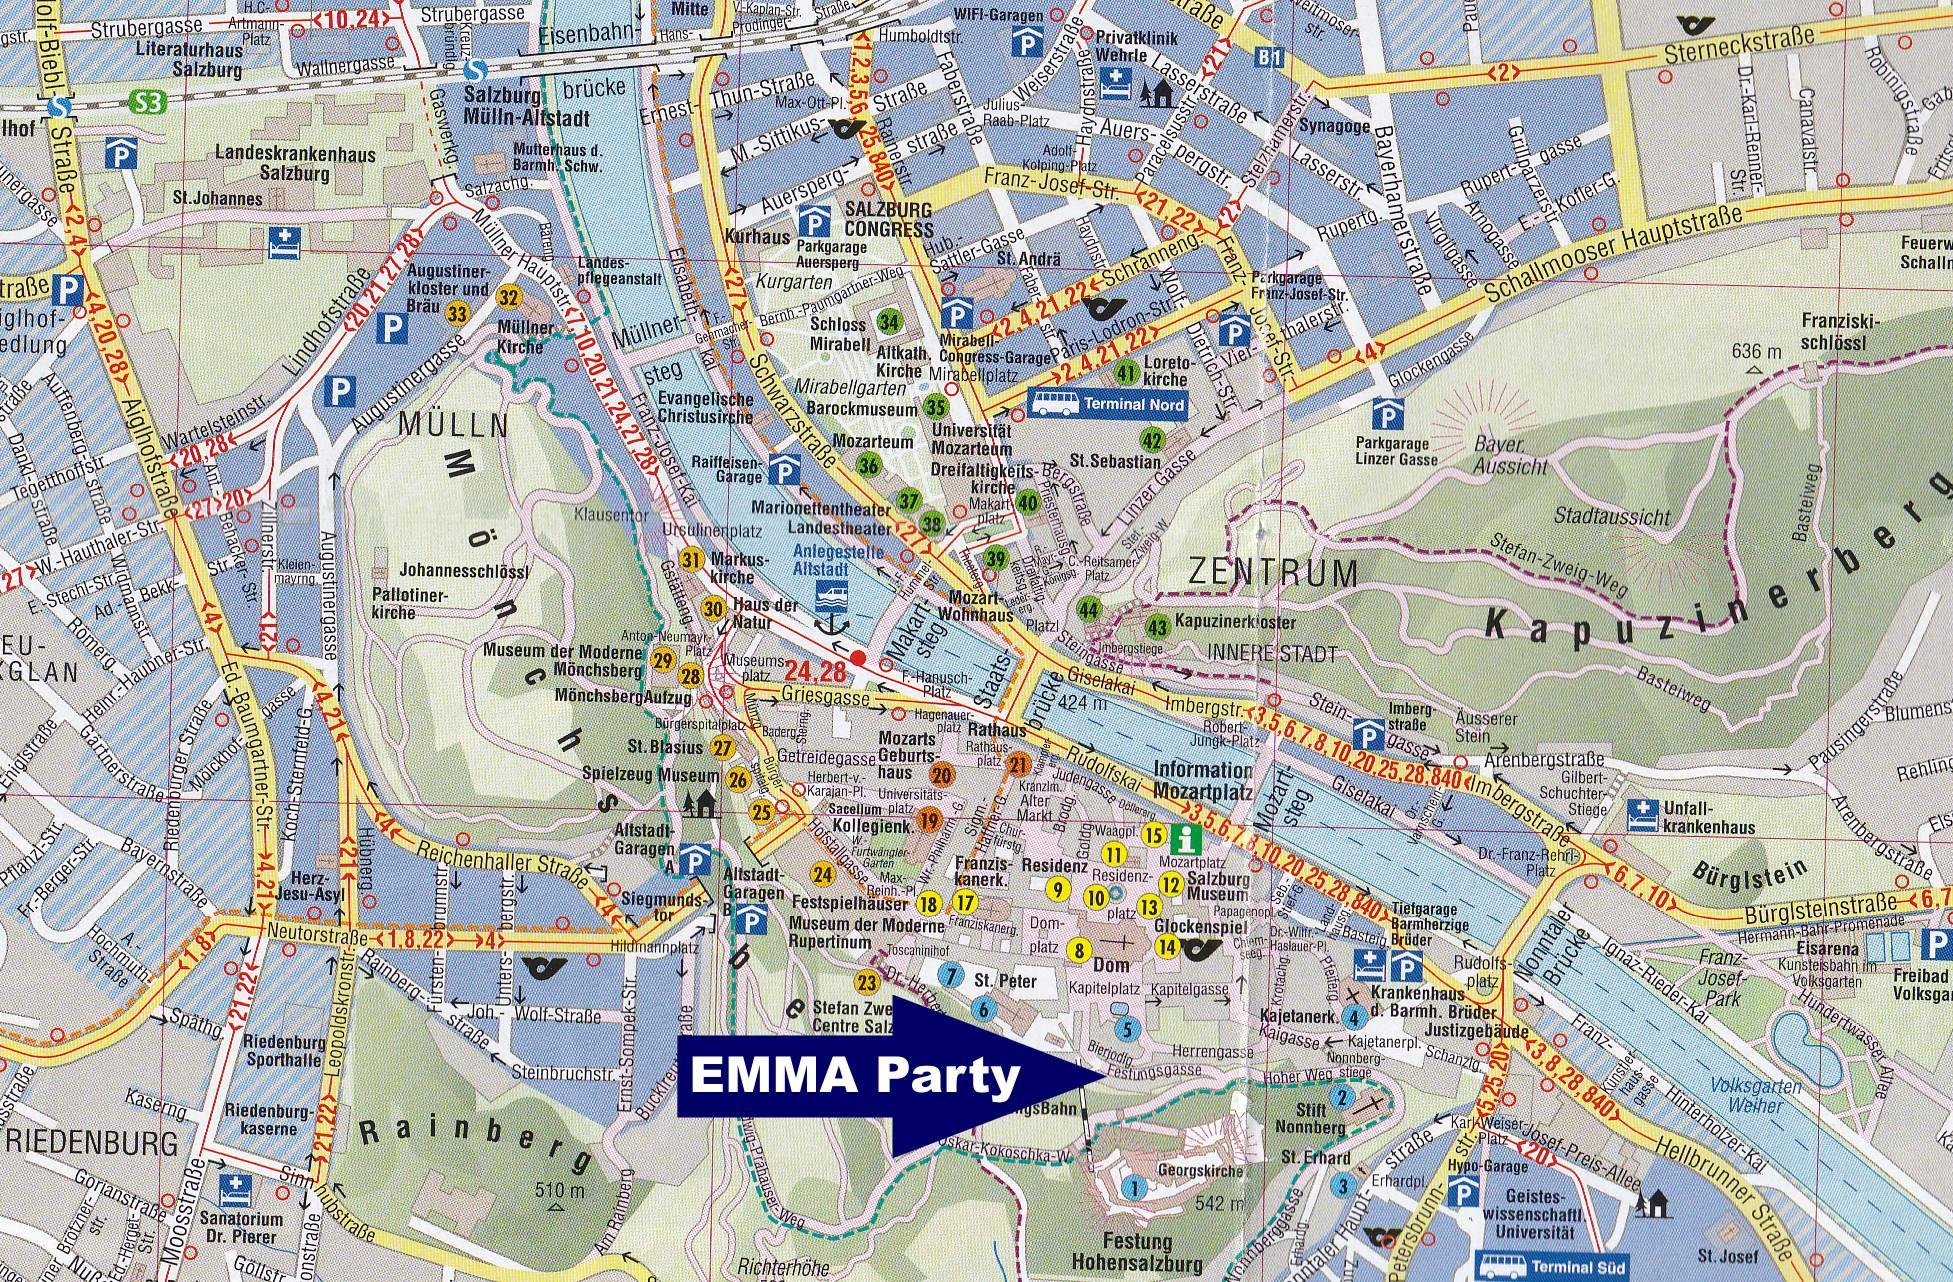 European Carmedia Championships 2013 EMMA Global